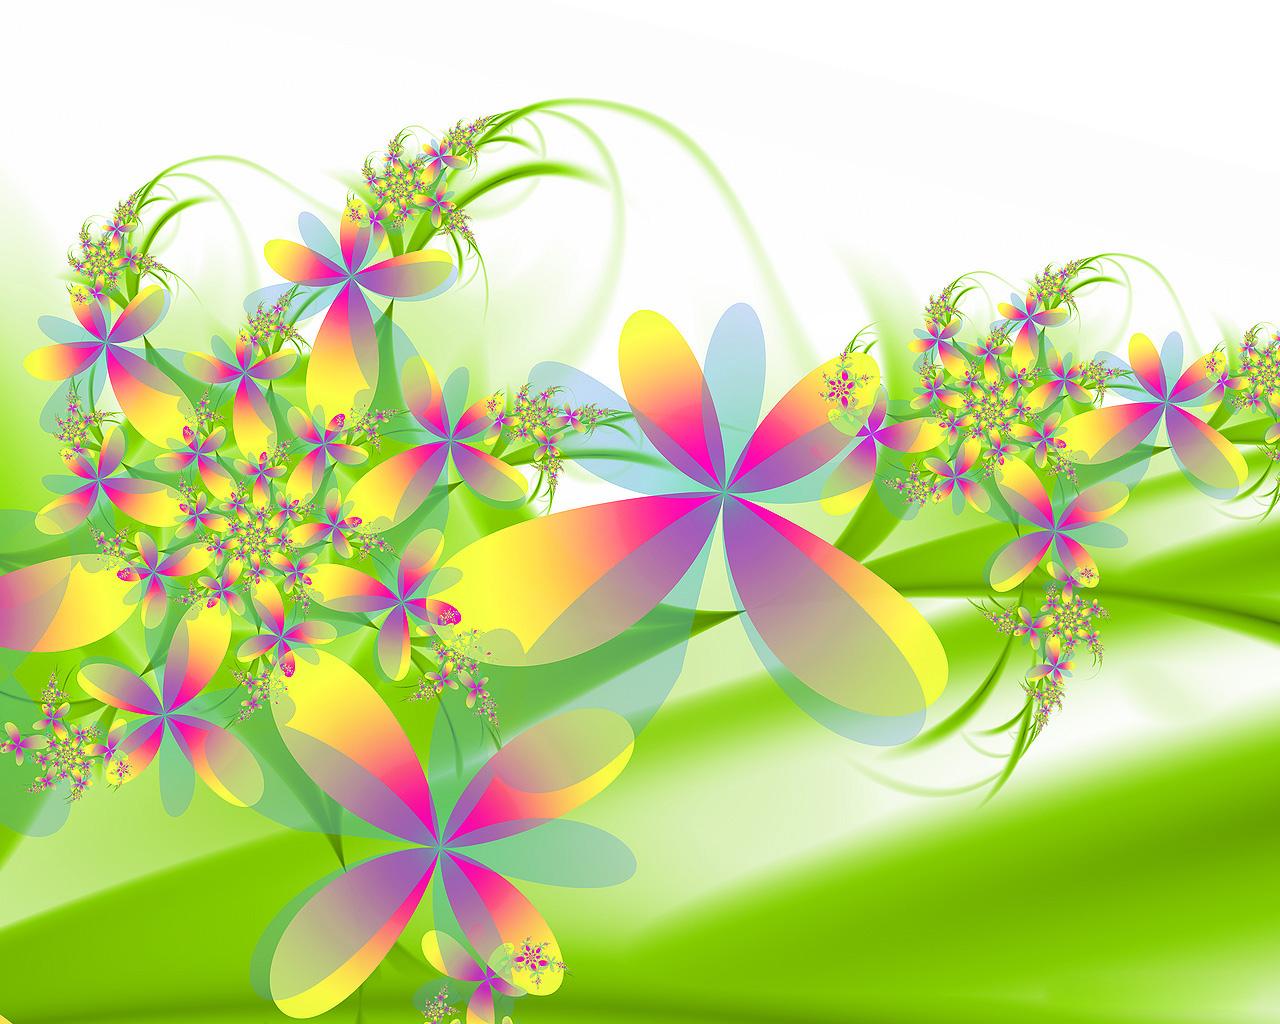 Flowers desktop wallpapers 1280x1024 - Flower wallpaper 3d pic ...